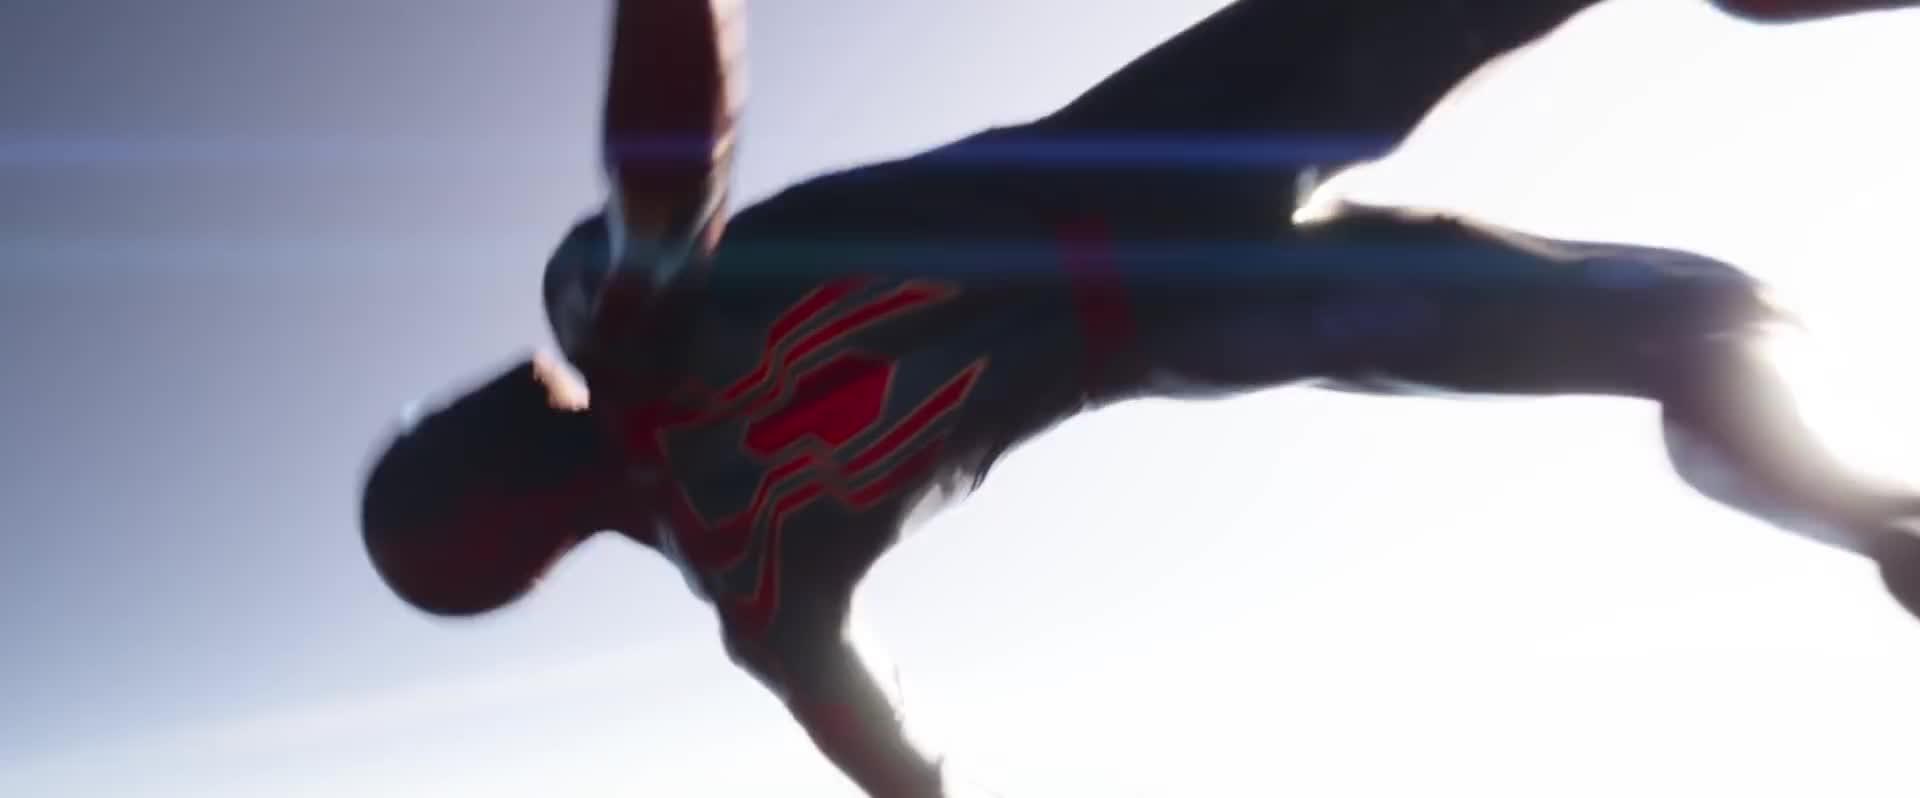 avengers, avengers: infinity war, comic books, comics, geeky, infinity war, marvel, nerdy, super hero, superhero, Marvel Studios' Avengers: Infinity War Official Trailer GIFs